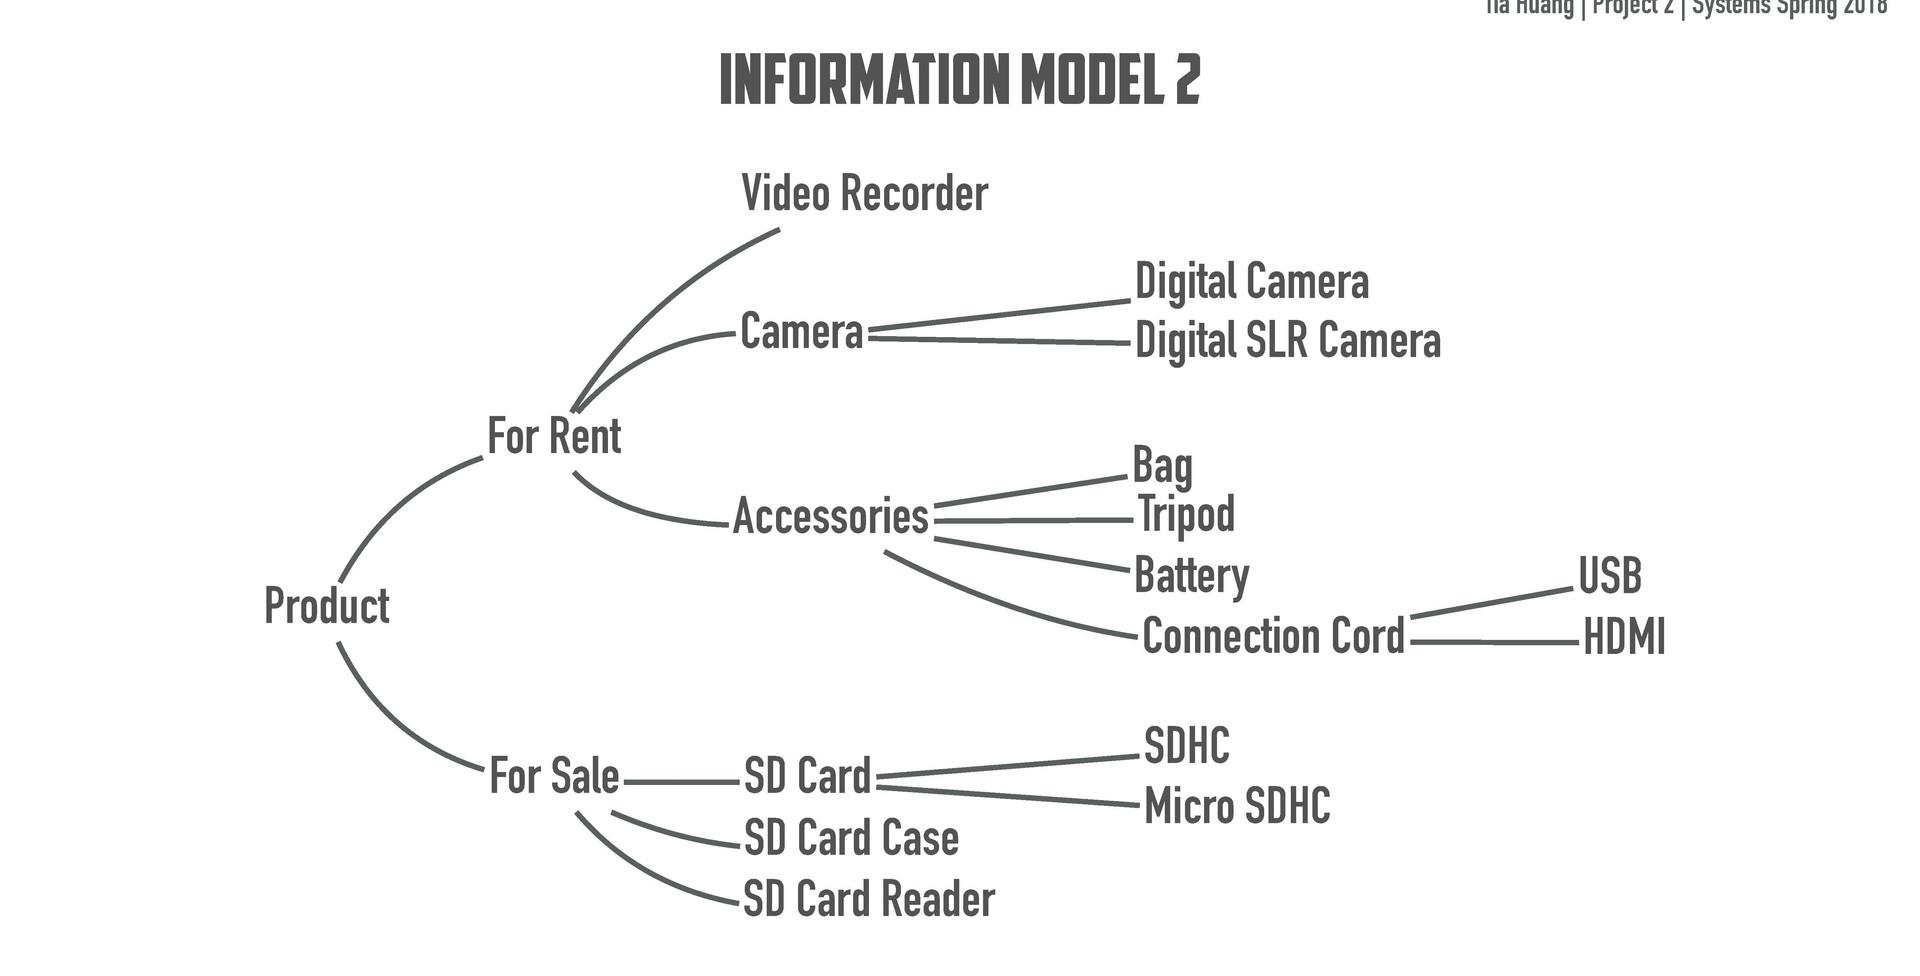 INFORMATION MODEL 2